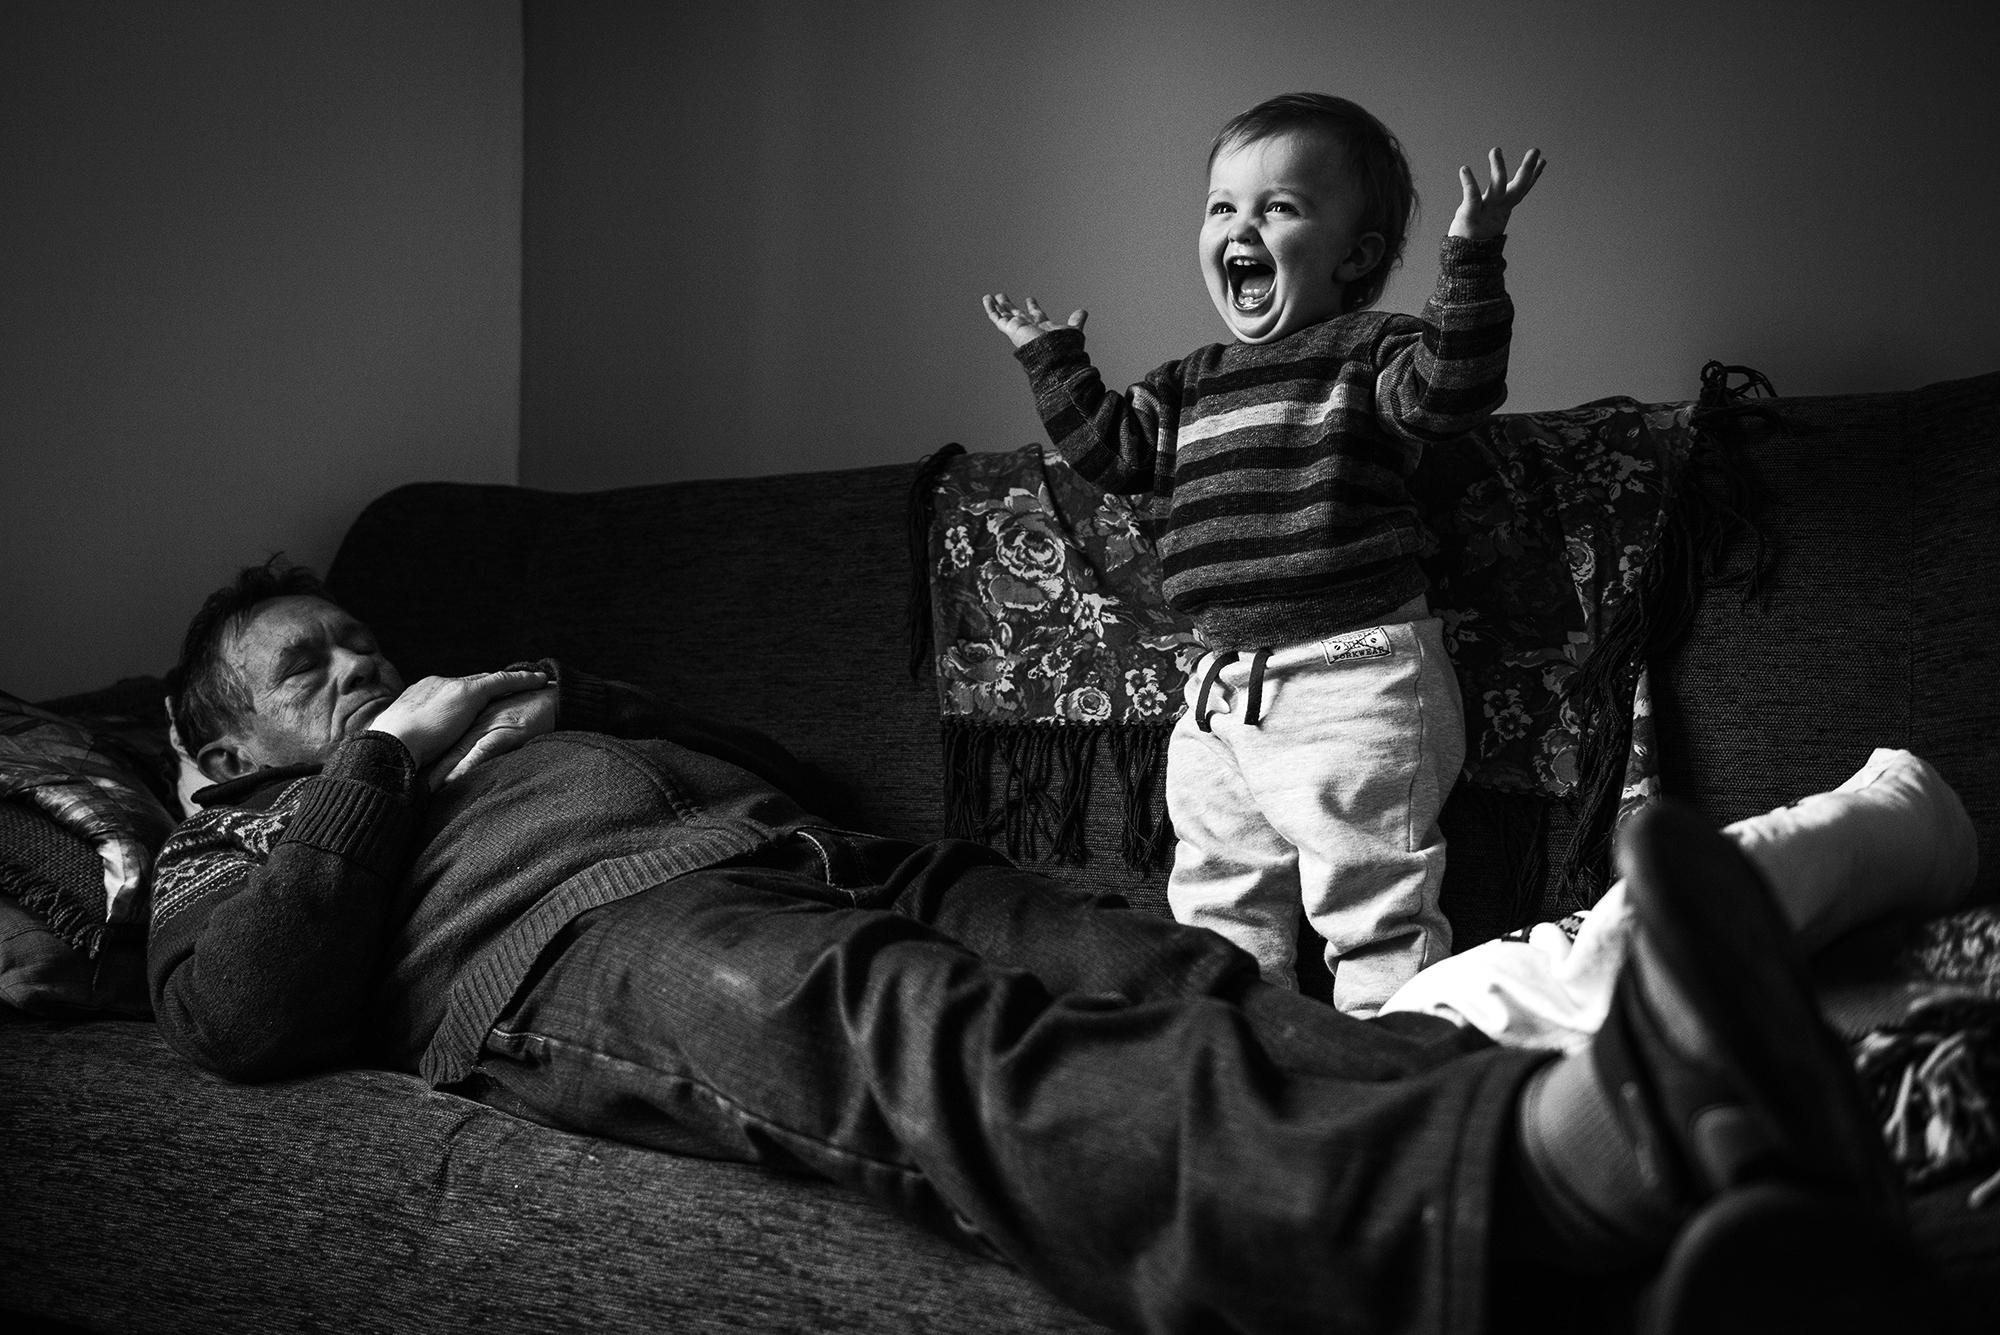 ©Alex Ingle, United Kingdom, Winner, Open Competition Smile, 2016 Sony World Photography Awards